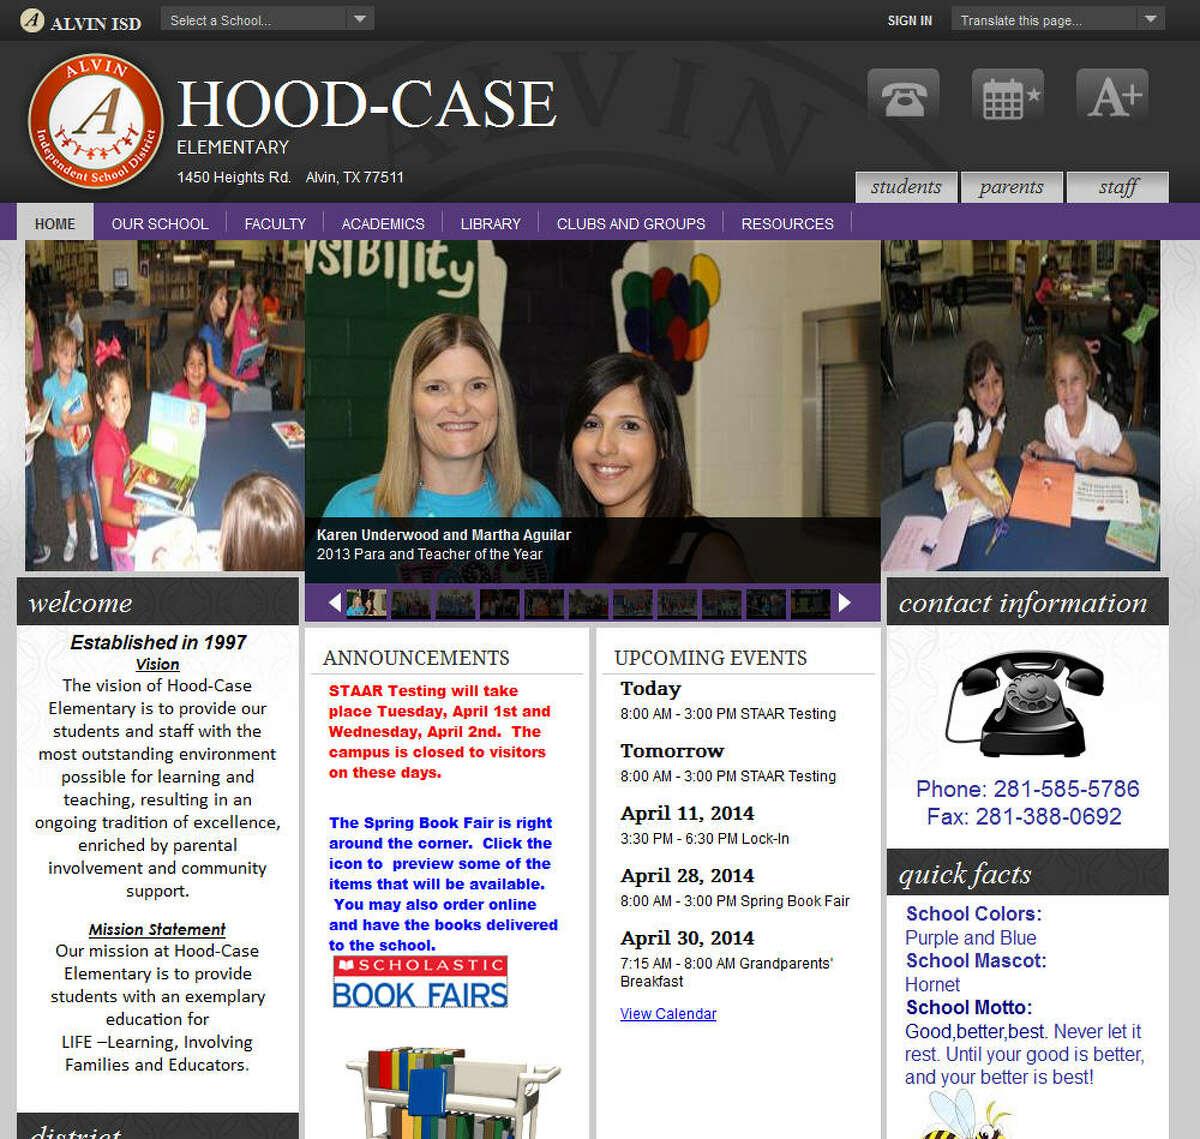 Alvin ISDHood-Case Elementary School Student: 774